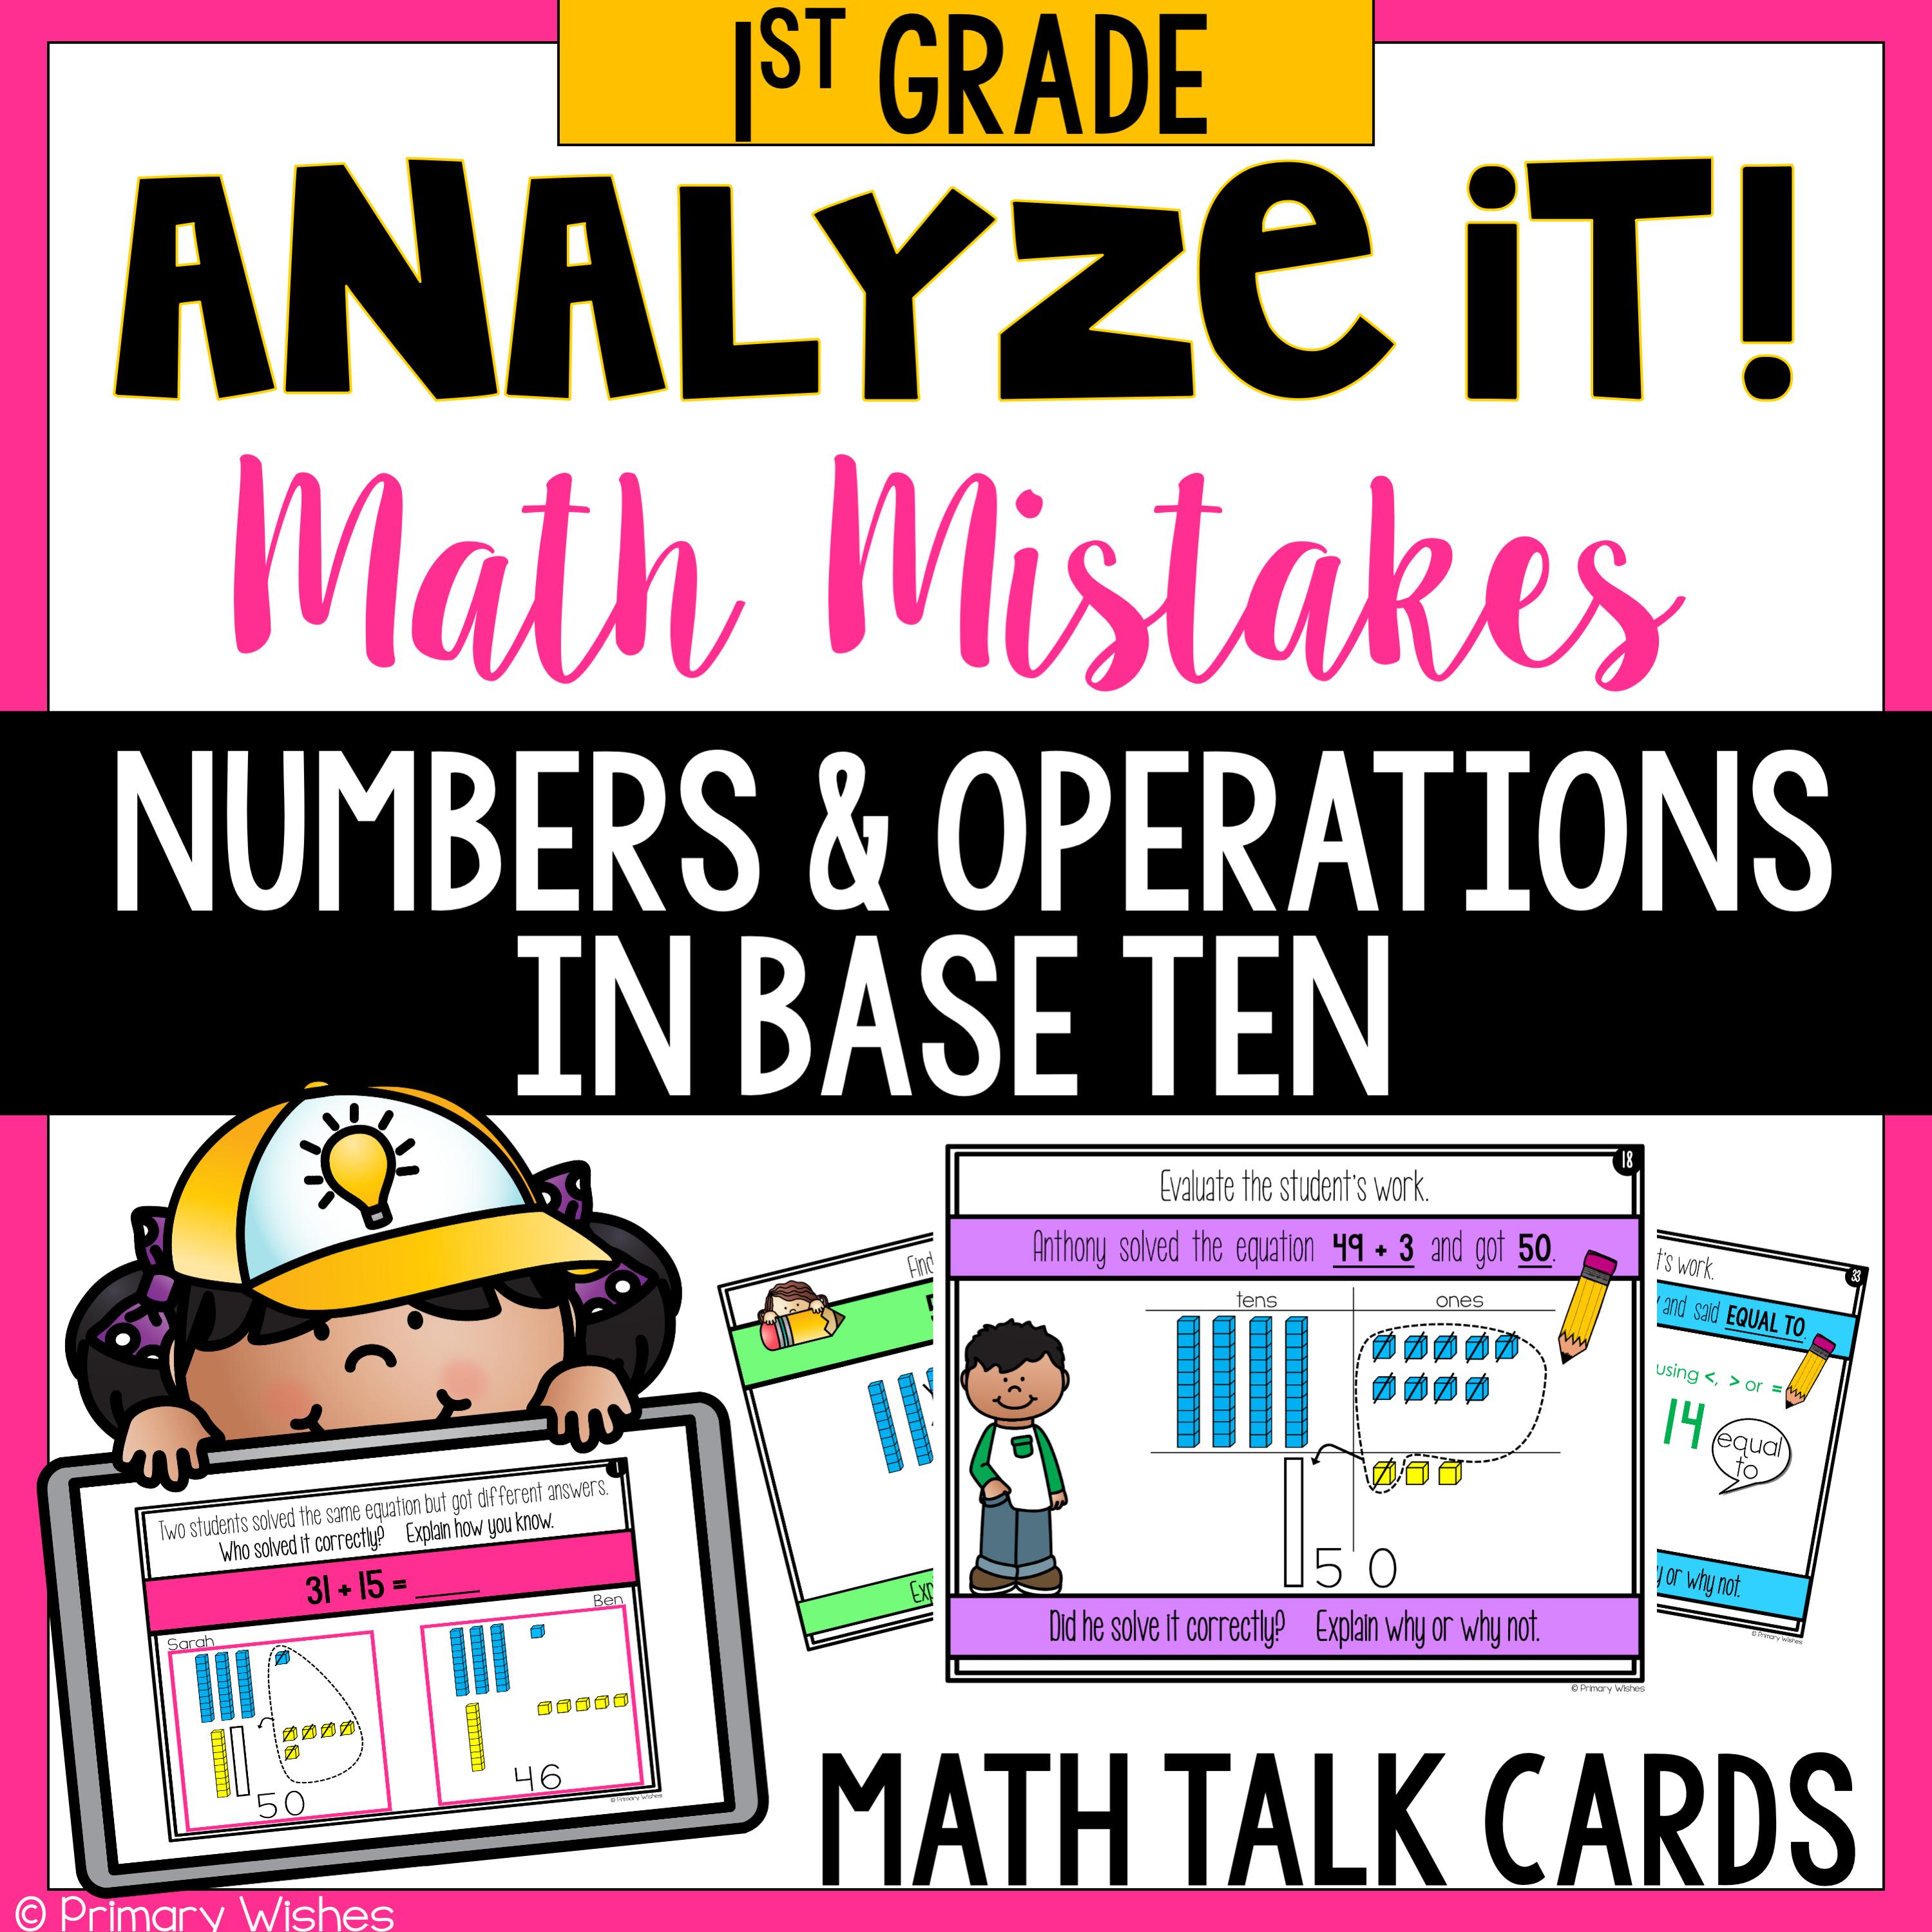 Math Mistake Cards